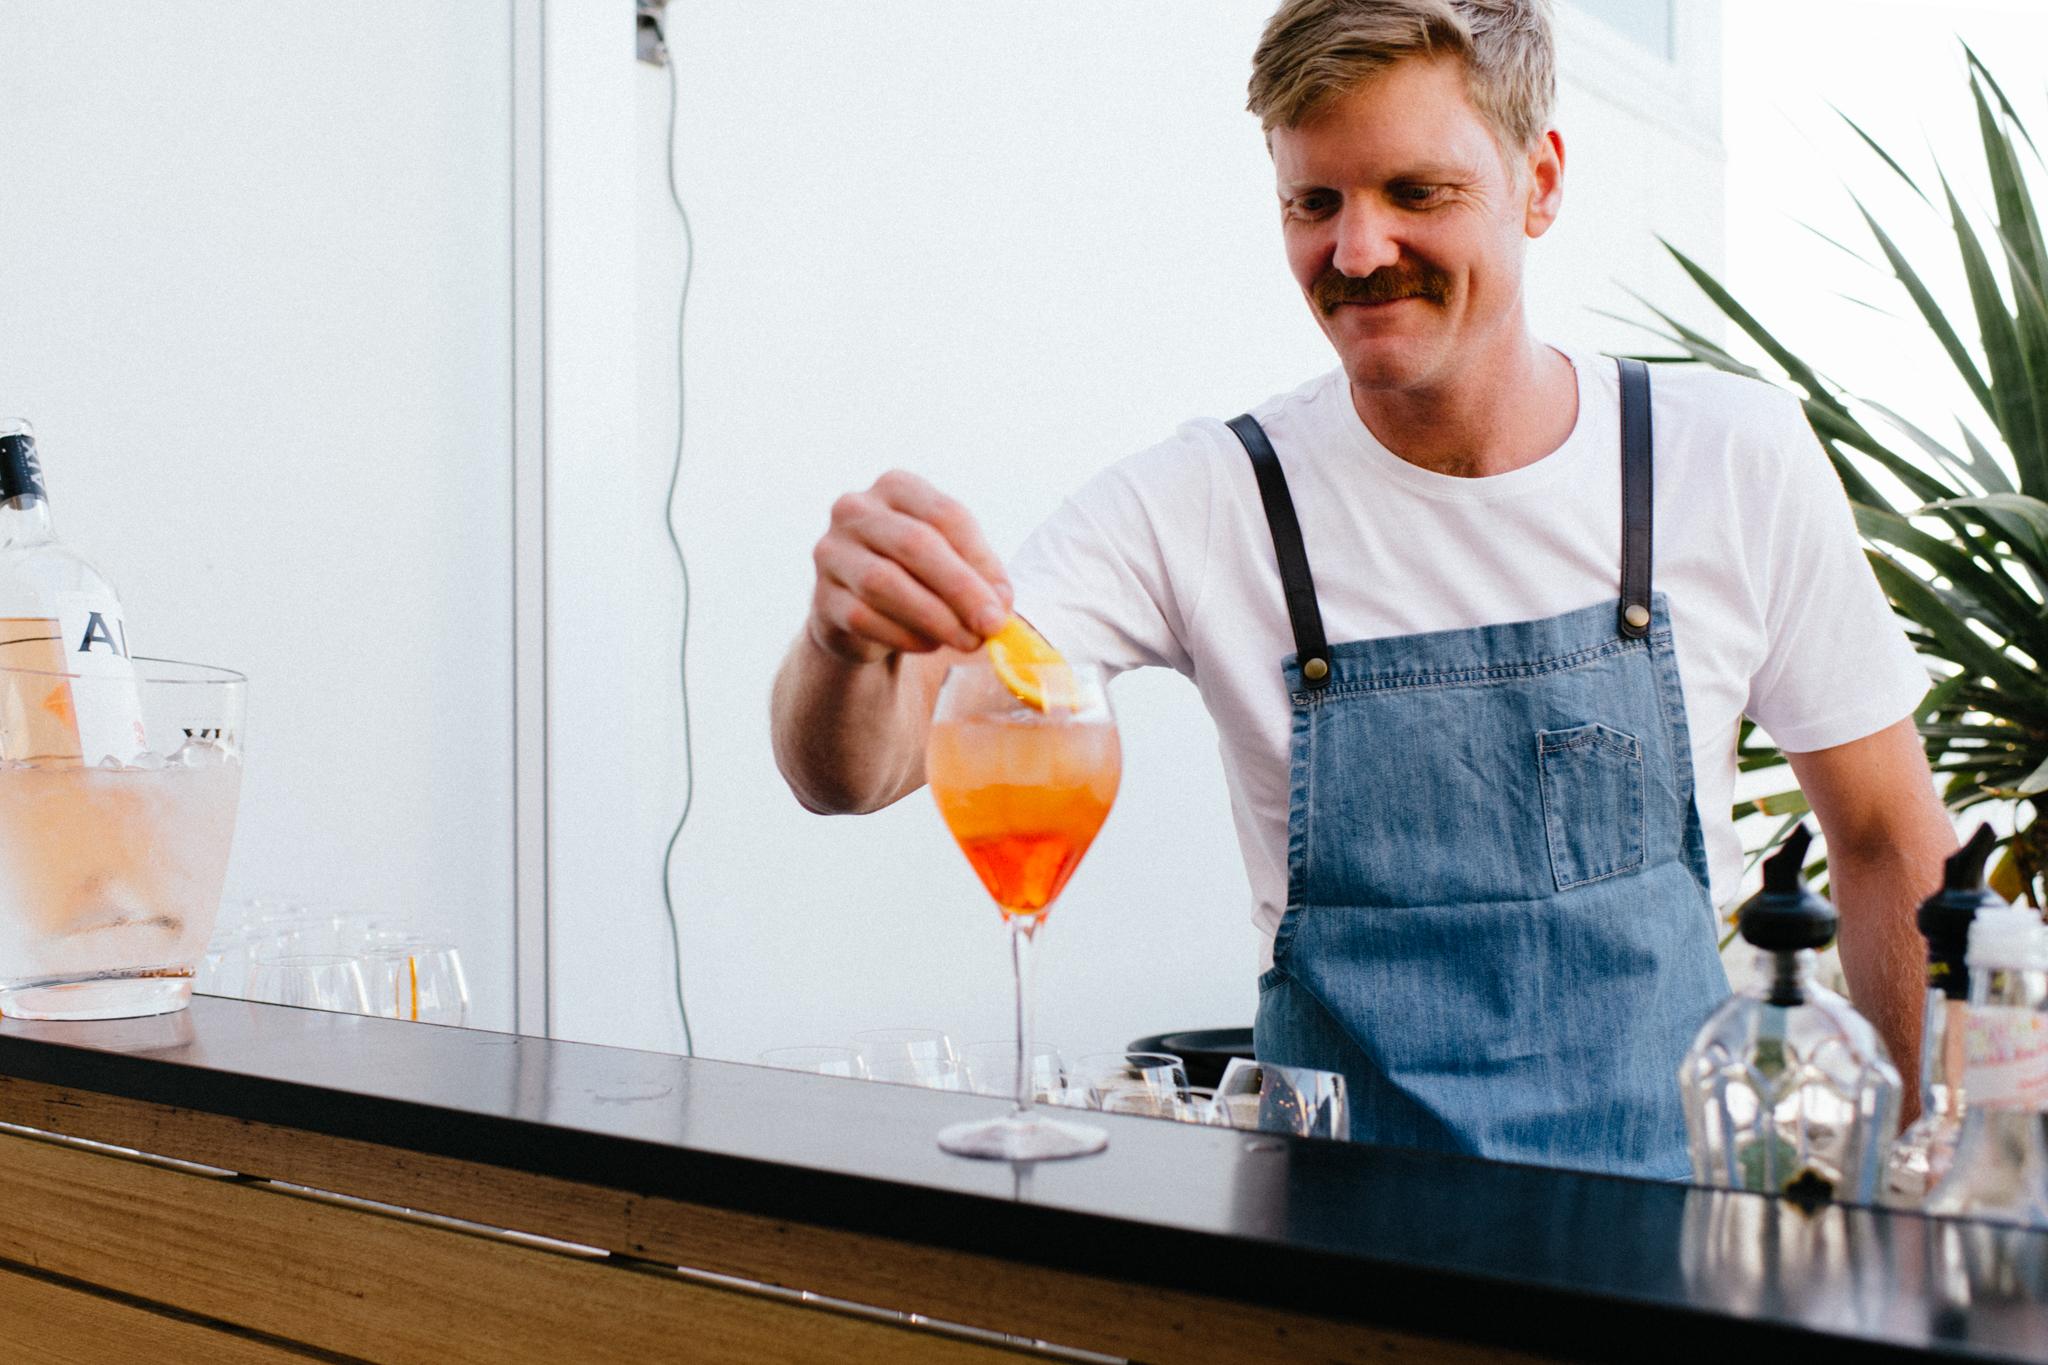 Bib & Tucker Fremantle Cocktails & Drinks on the beach